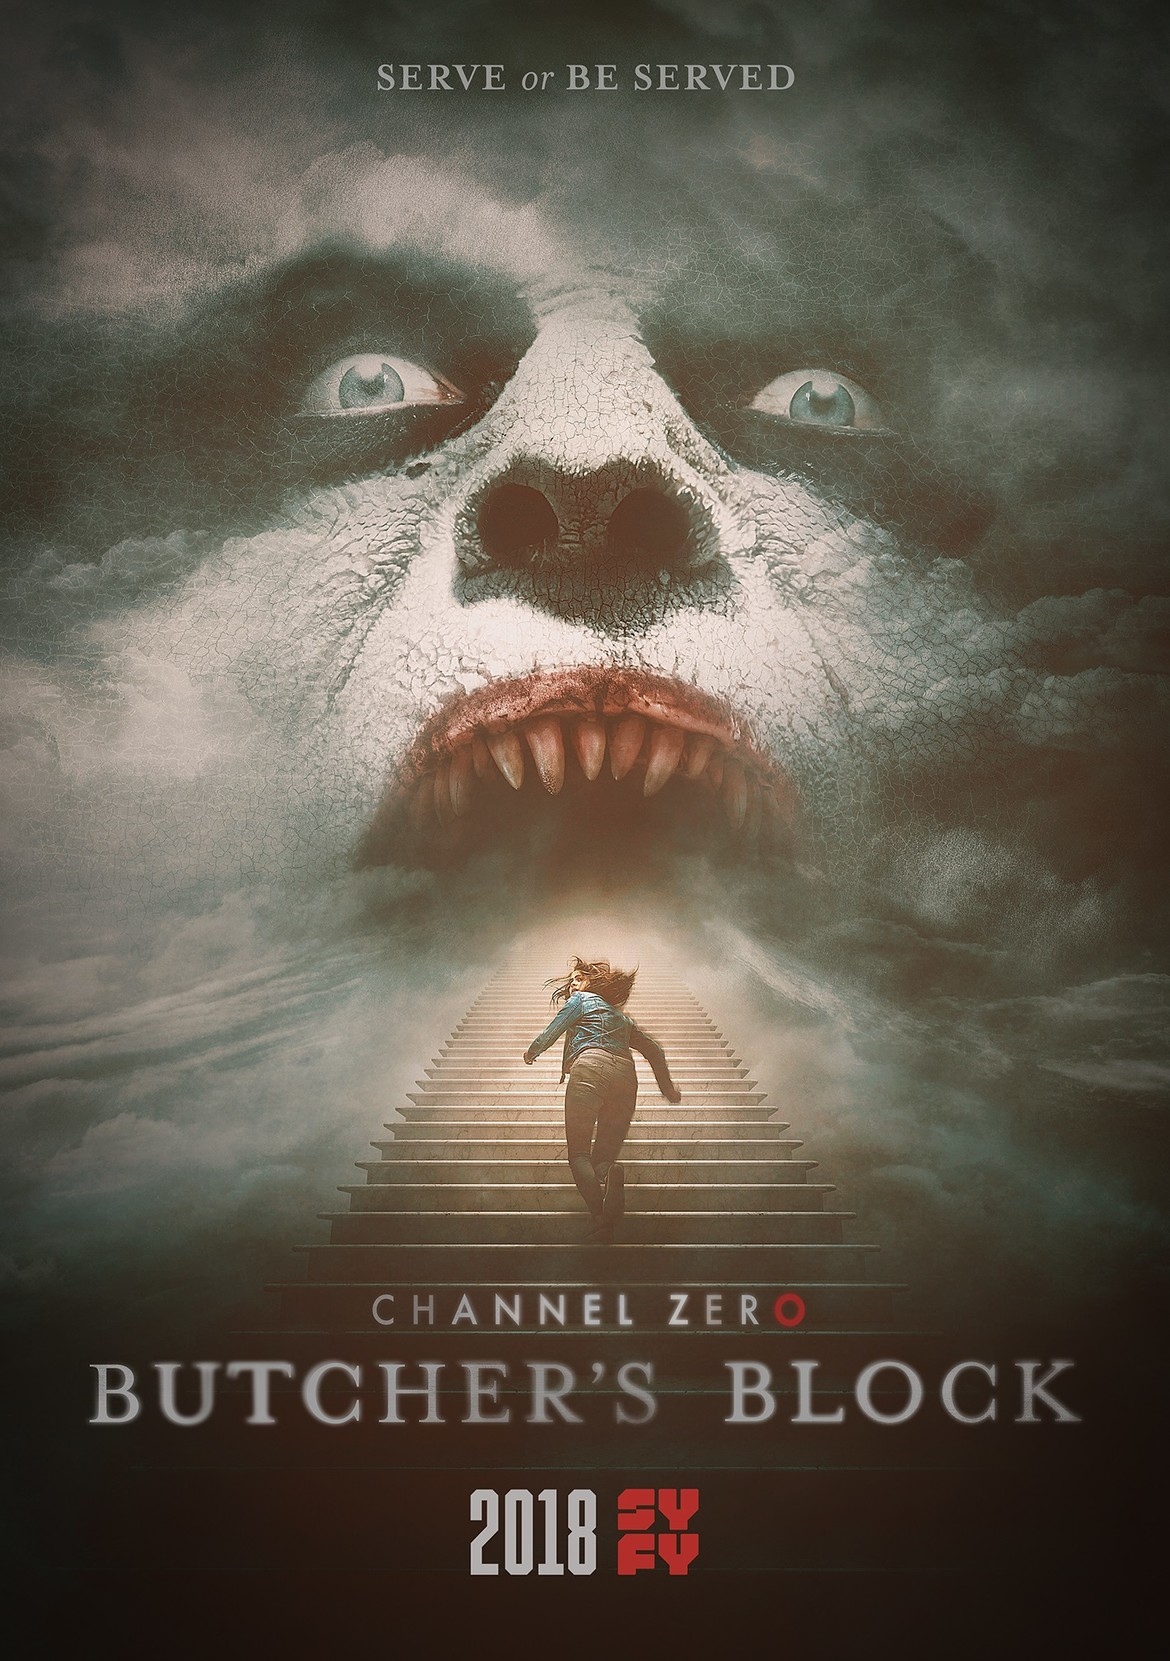 channel-zero-butcher-block.jpg